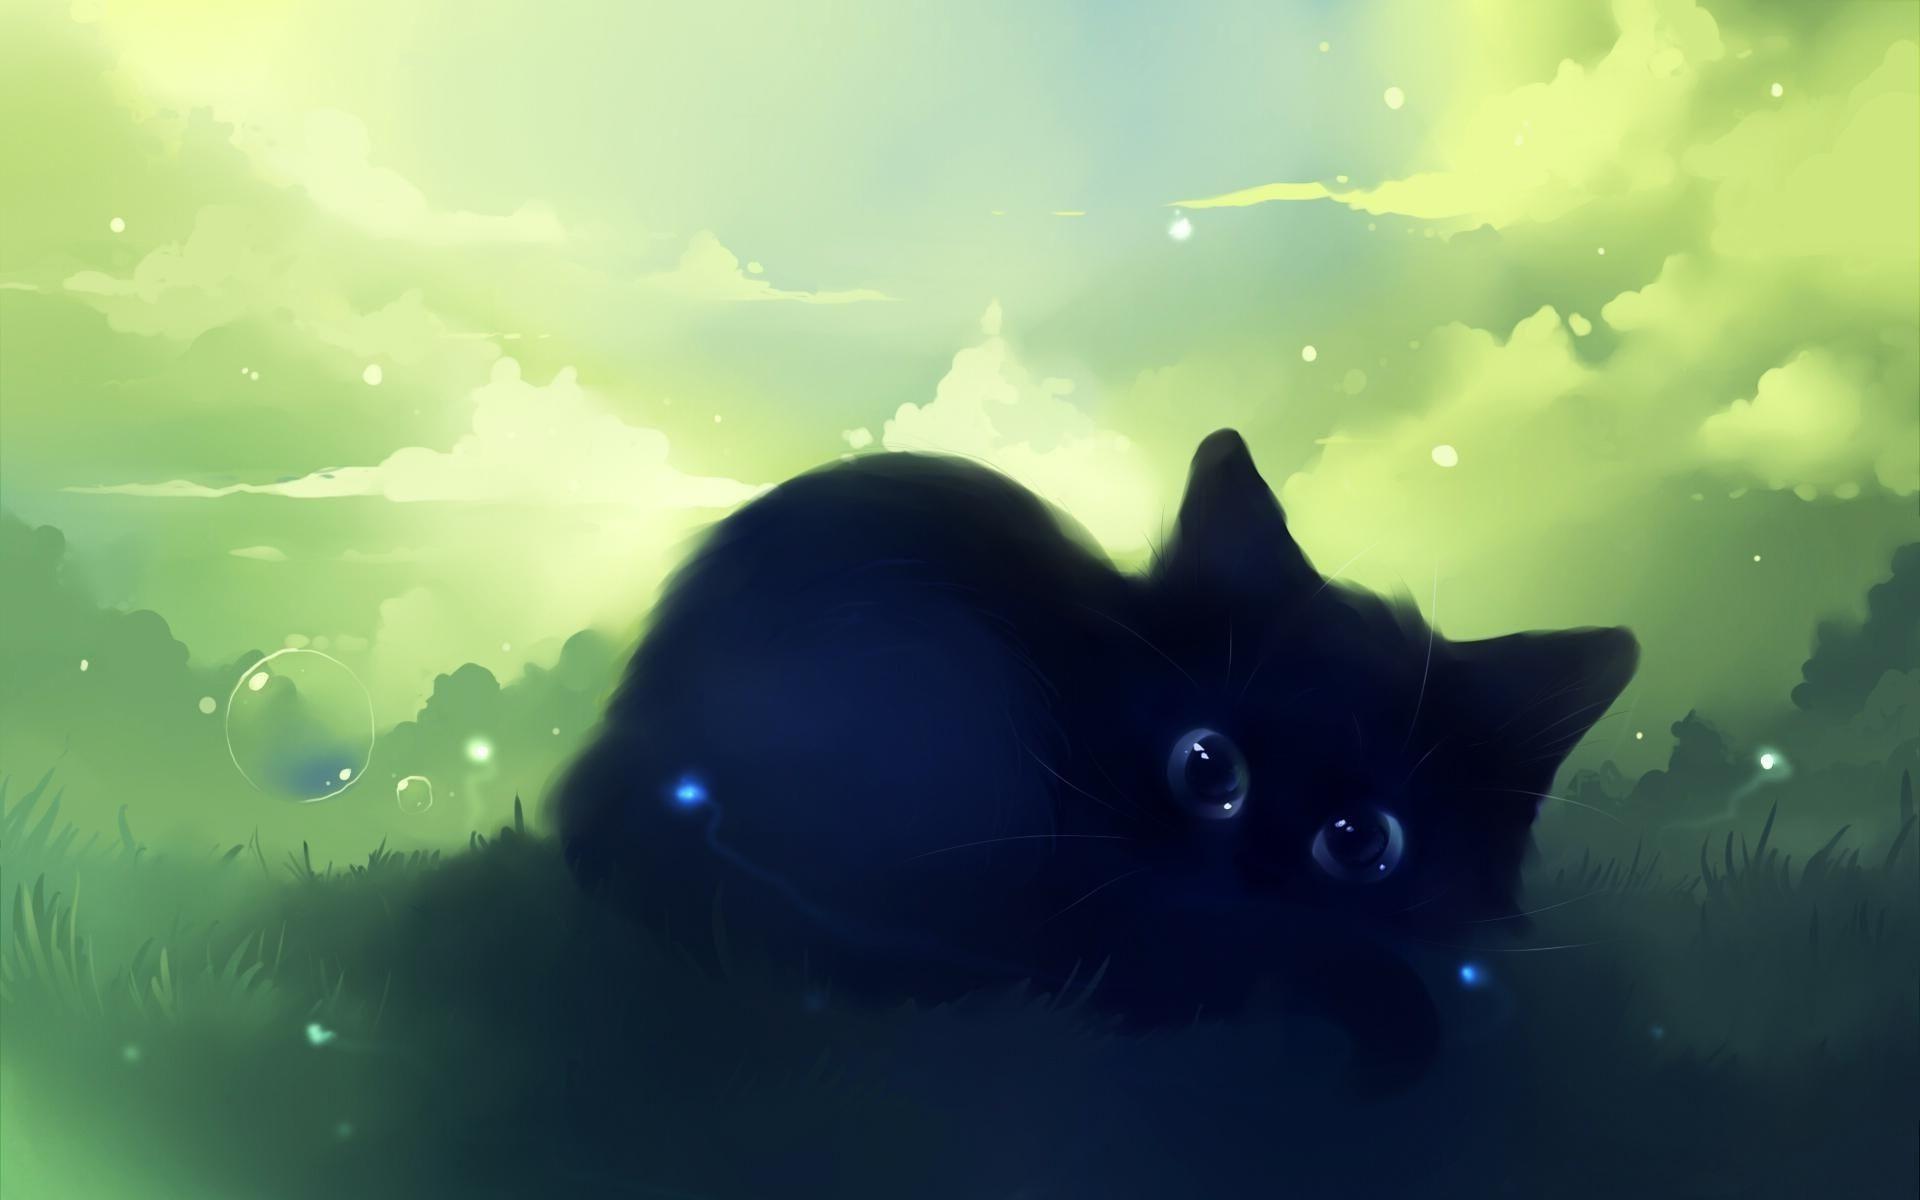 Download Wallpapers Download 2790x2547 Animals Grass: Sleeping Grass Apofiss Eyes Cat. Desktop Wallpapers For Free